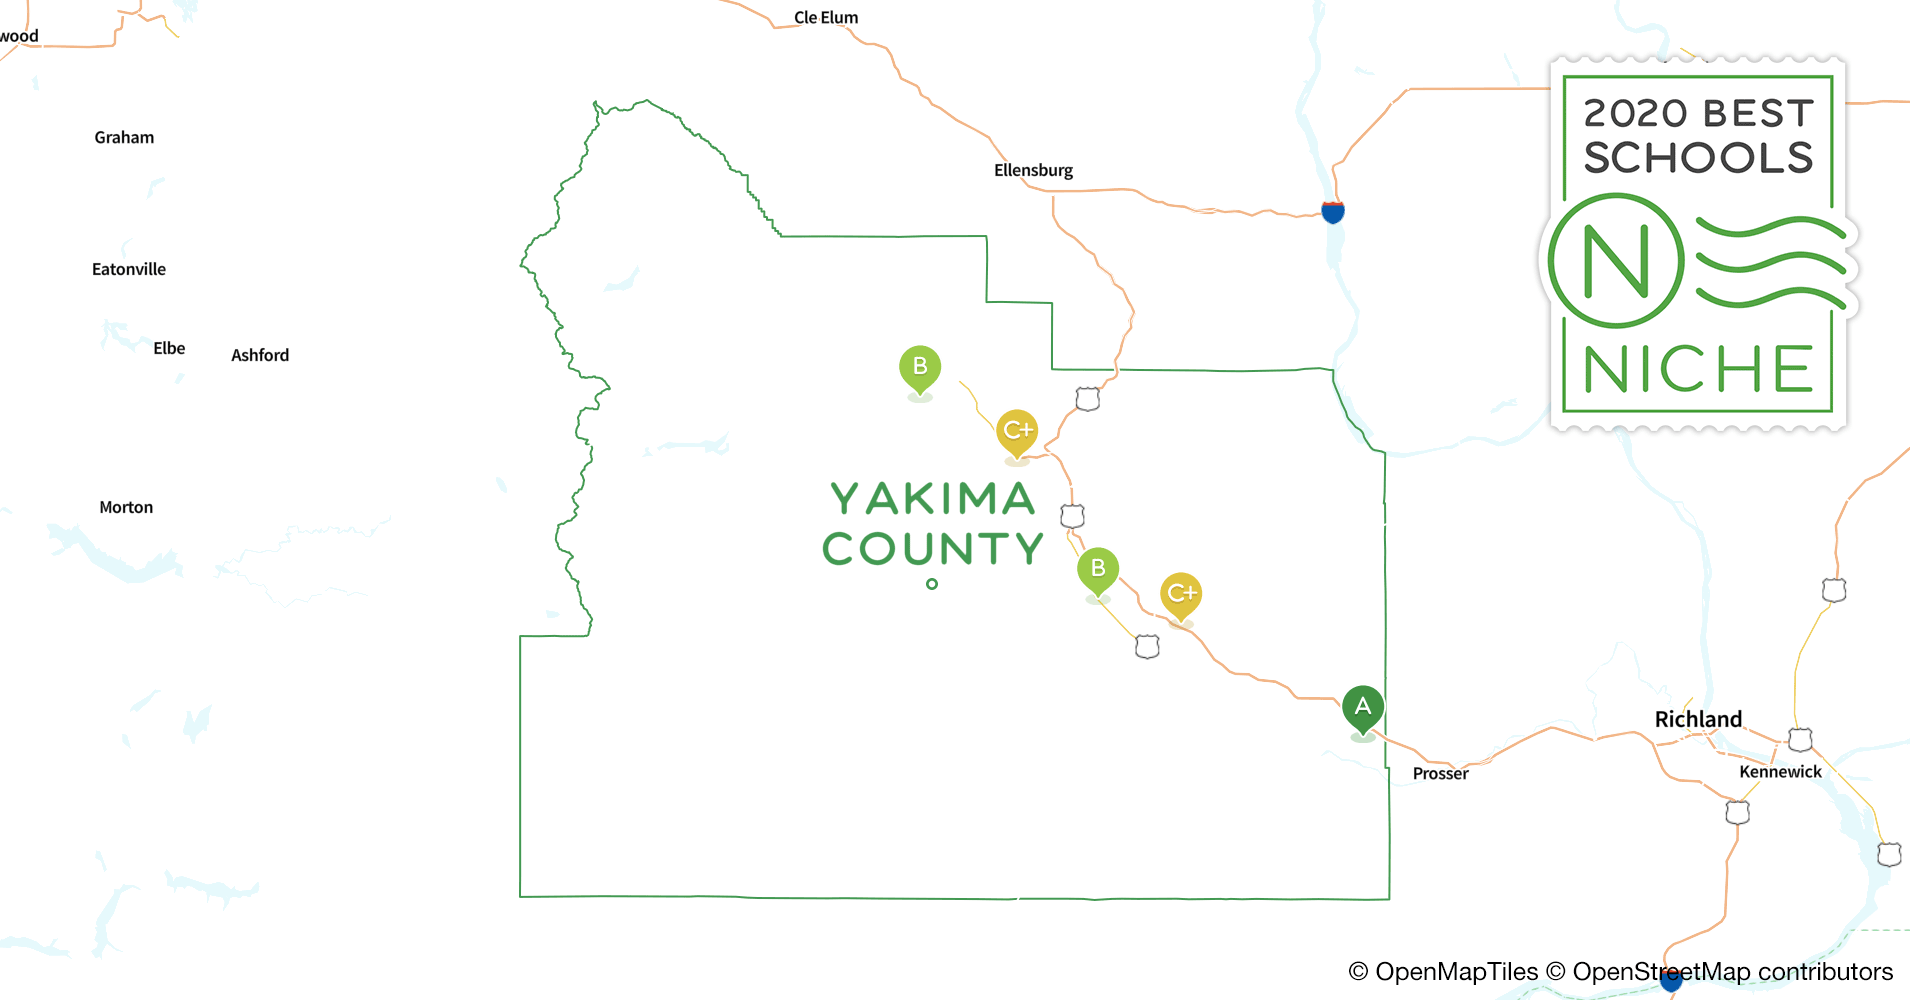 2020 Best High s in Yakima County, WA - Niche Yakima County Map on whatcom county, yakima wa history, northwest ga county map, pierce county, wenatchee county map, spokane county, san juan county, lewis county, grays harbor county, yakima area wineries, roosevelt county map, chelan county map, columbia county, yakima weather, yakima union gap wa, lincoln county, skagit county, clark county map, yakima washington, snohomish county, yakima indian clothing, charlottesville county map, king county, okanogan county, ketchikan county map, mount rainier national park map, jefferson county, kitsap county, clark county, grant county, benton county, yakima eisenhower high school, yakima mall, washington map, riverside county map, rowan county ky map, franklin county, yakima restaurants,